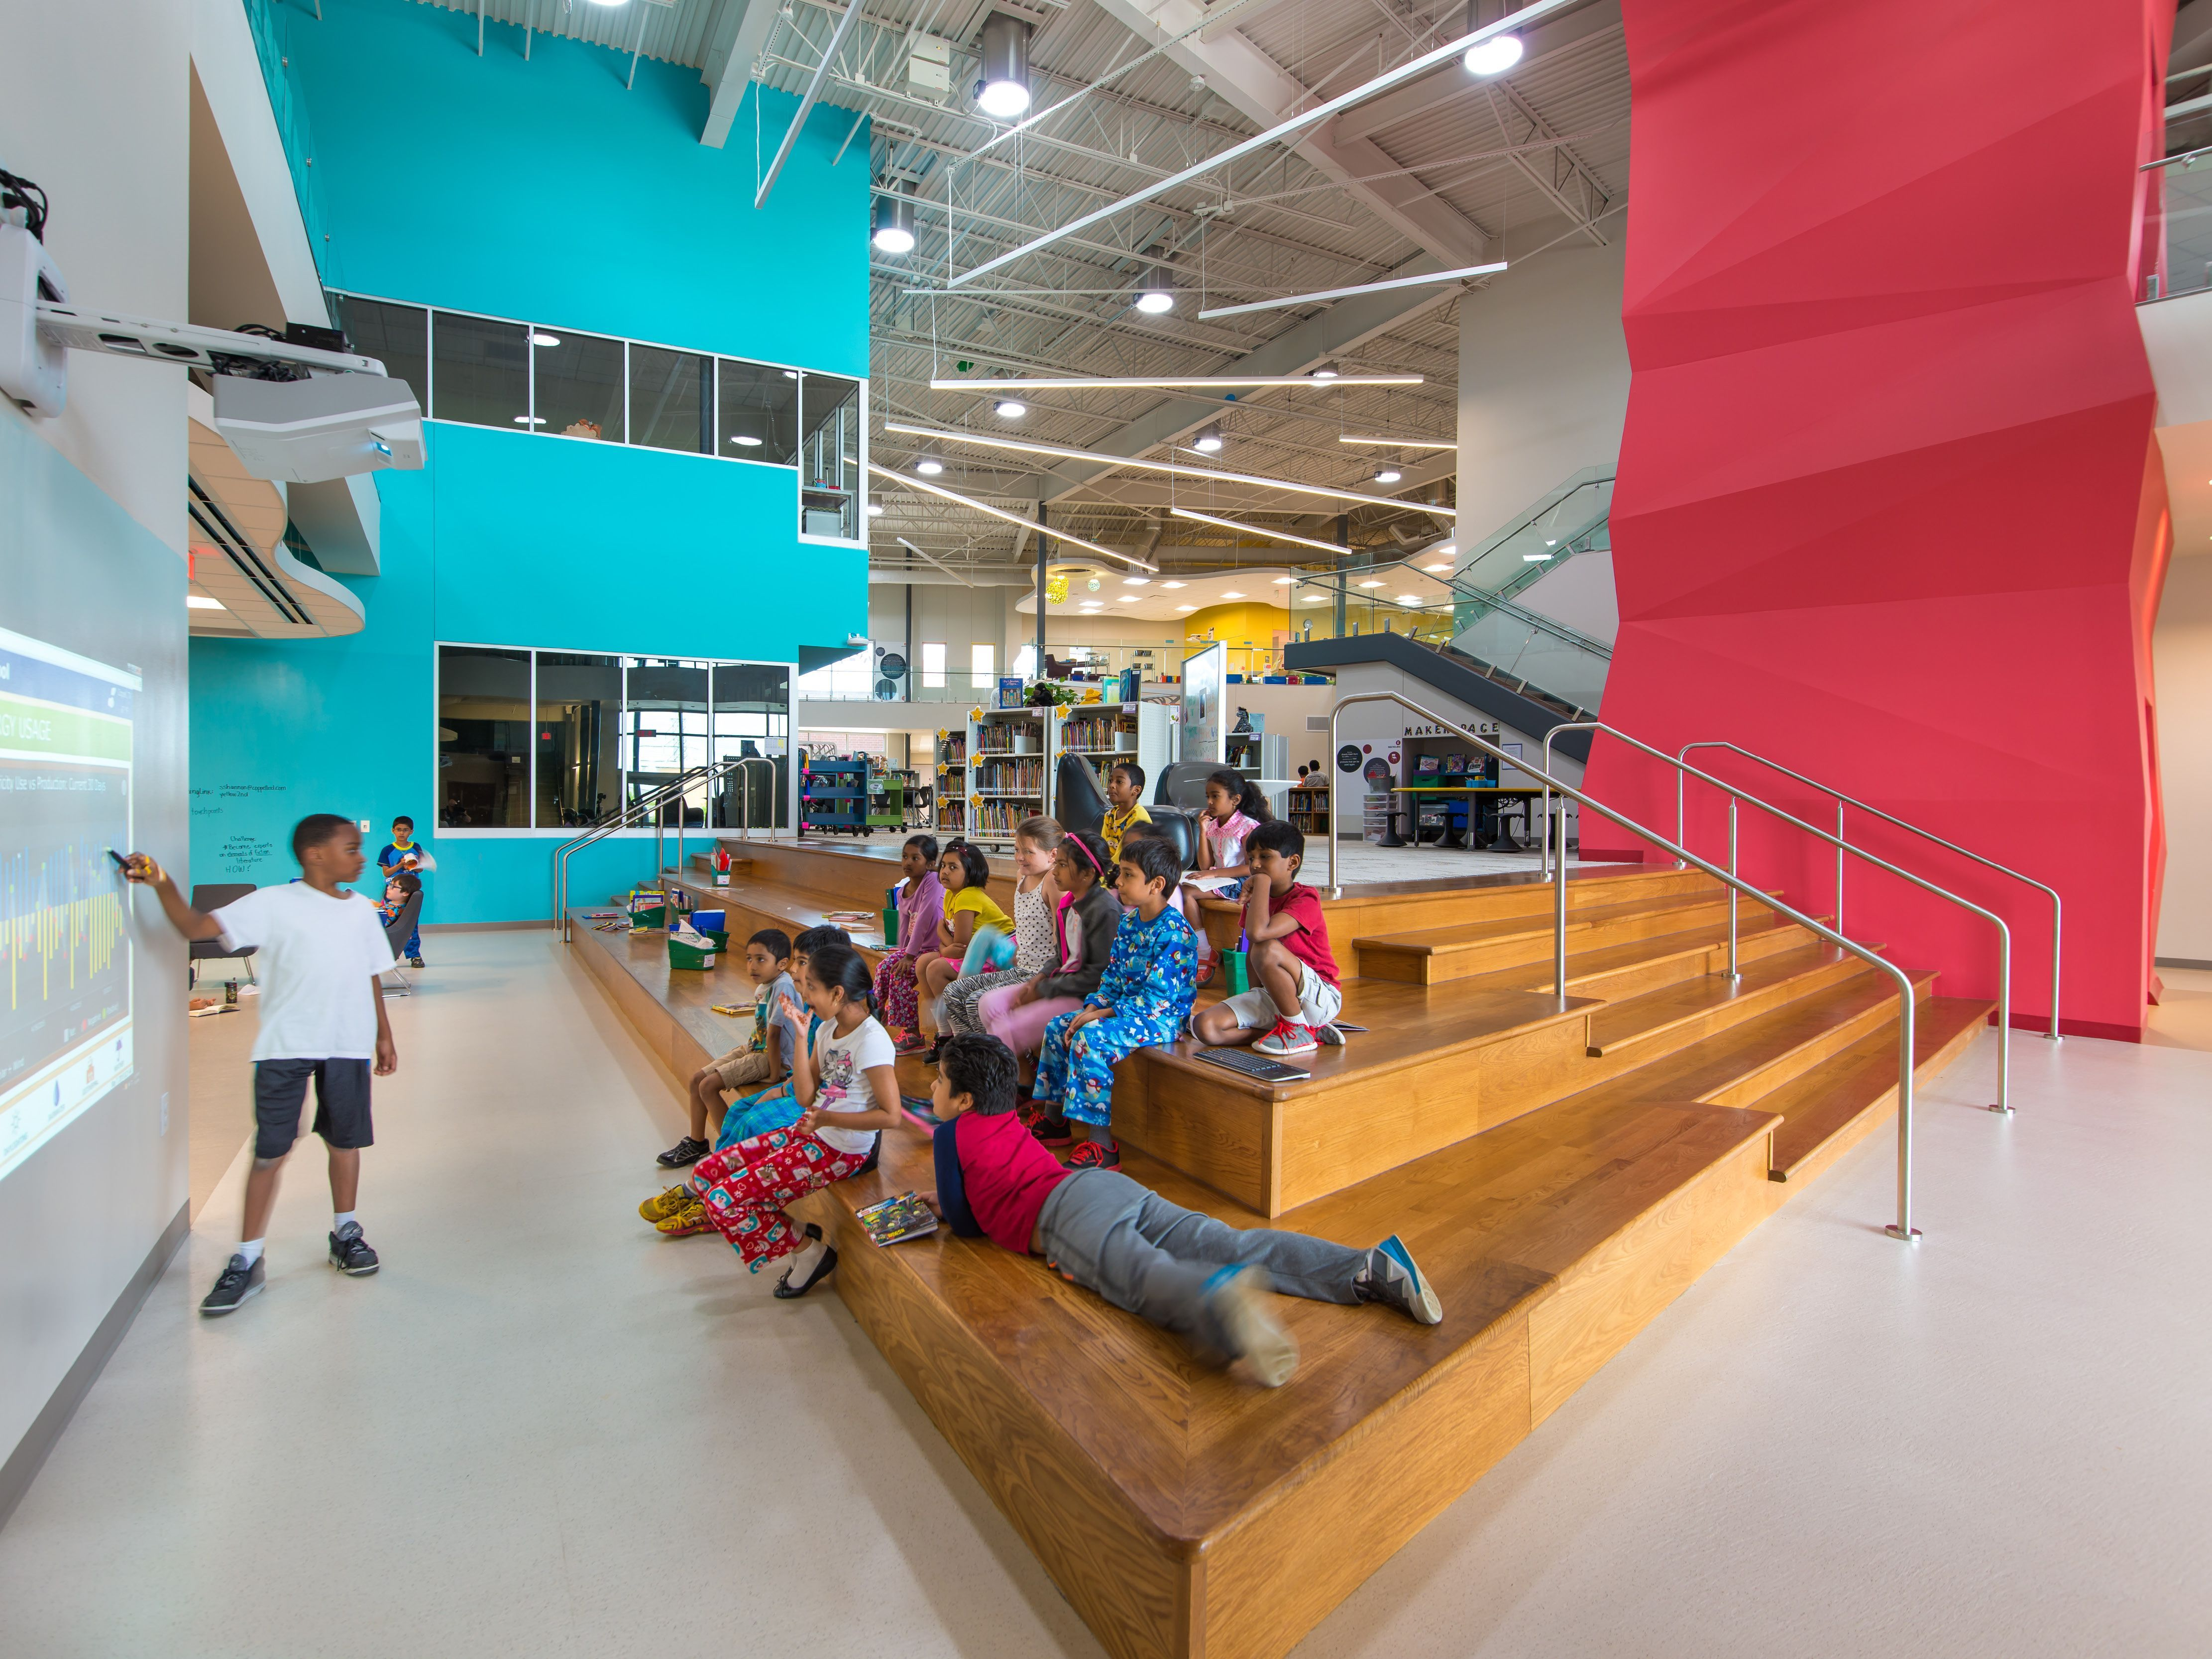 Aia Dallas Design Awards School Architecture Elementary Schools School Interior